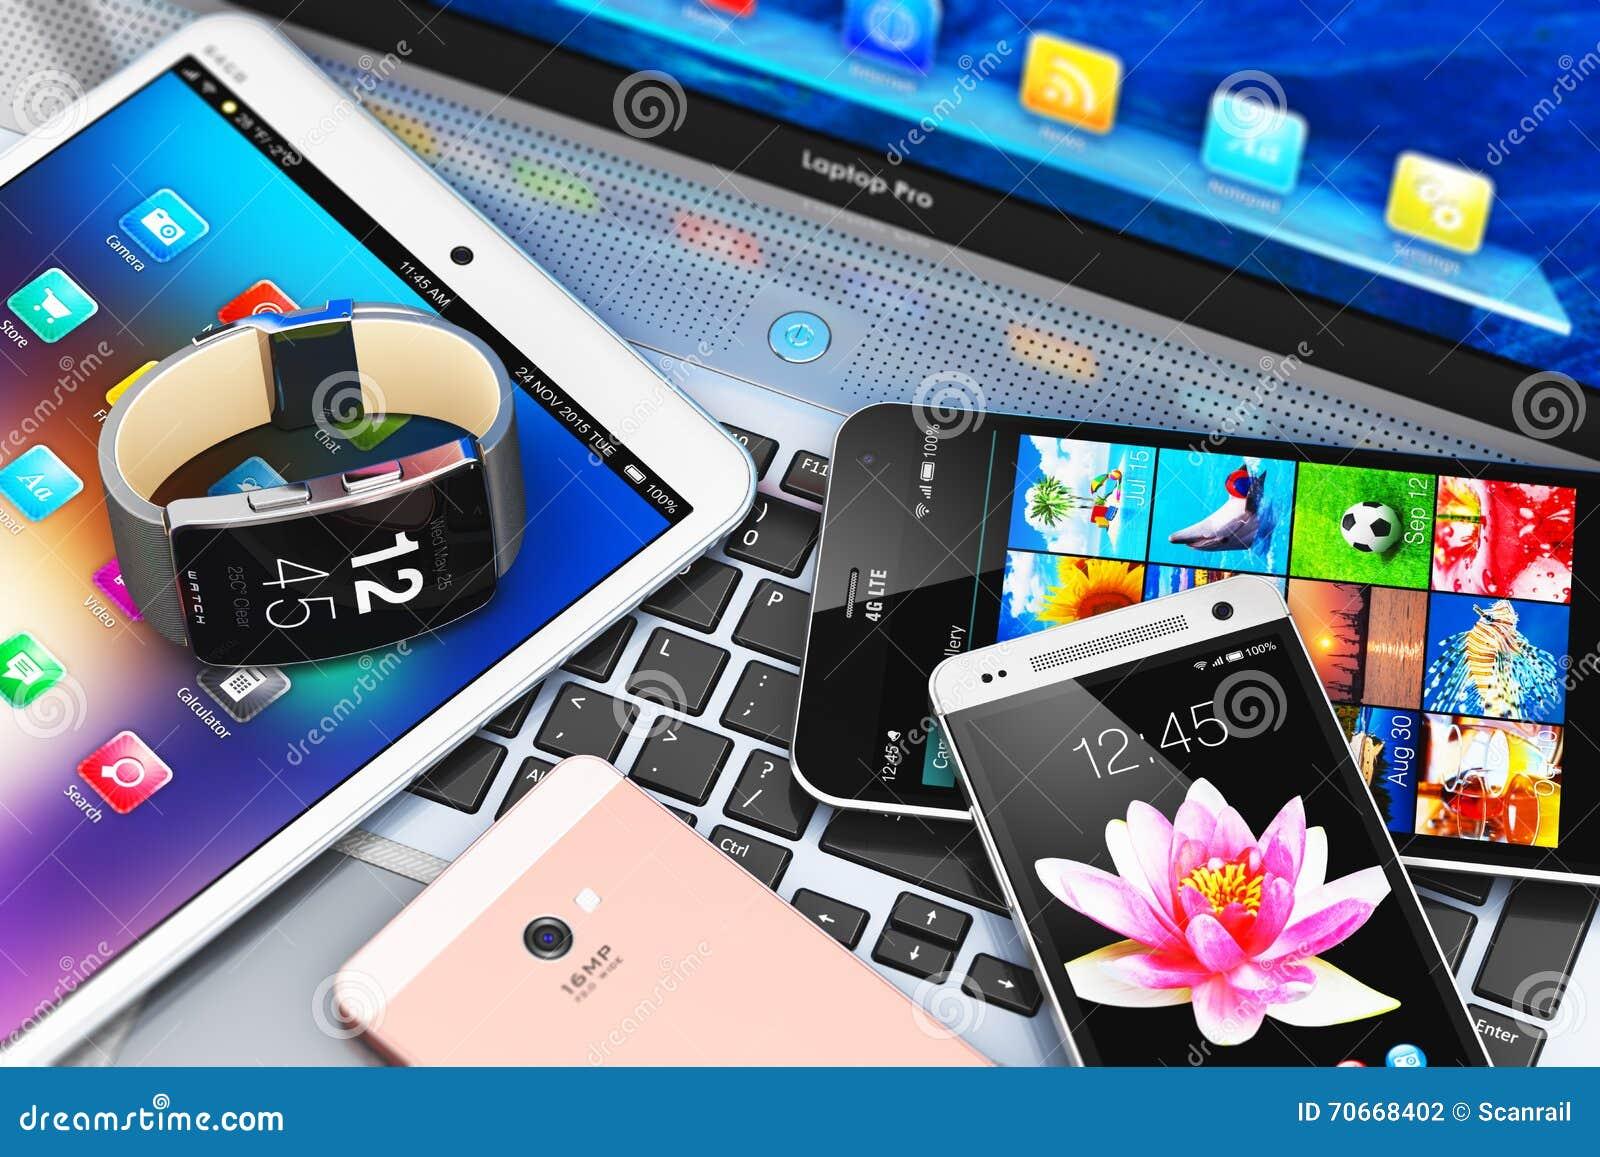 Modern mobile devices stock illustration illustration of office 70668402 - Office for mobile devices ...